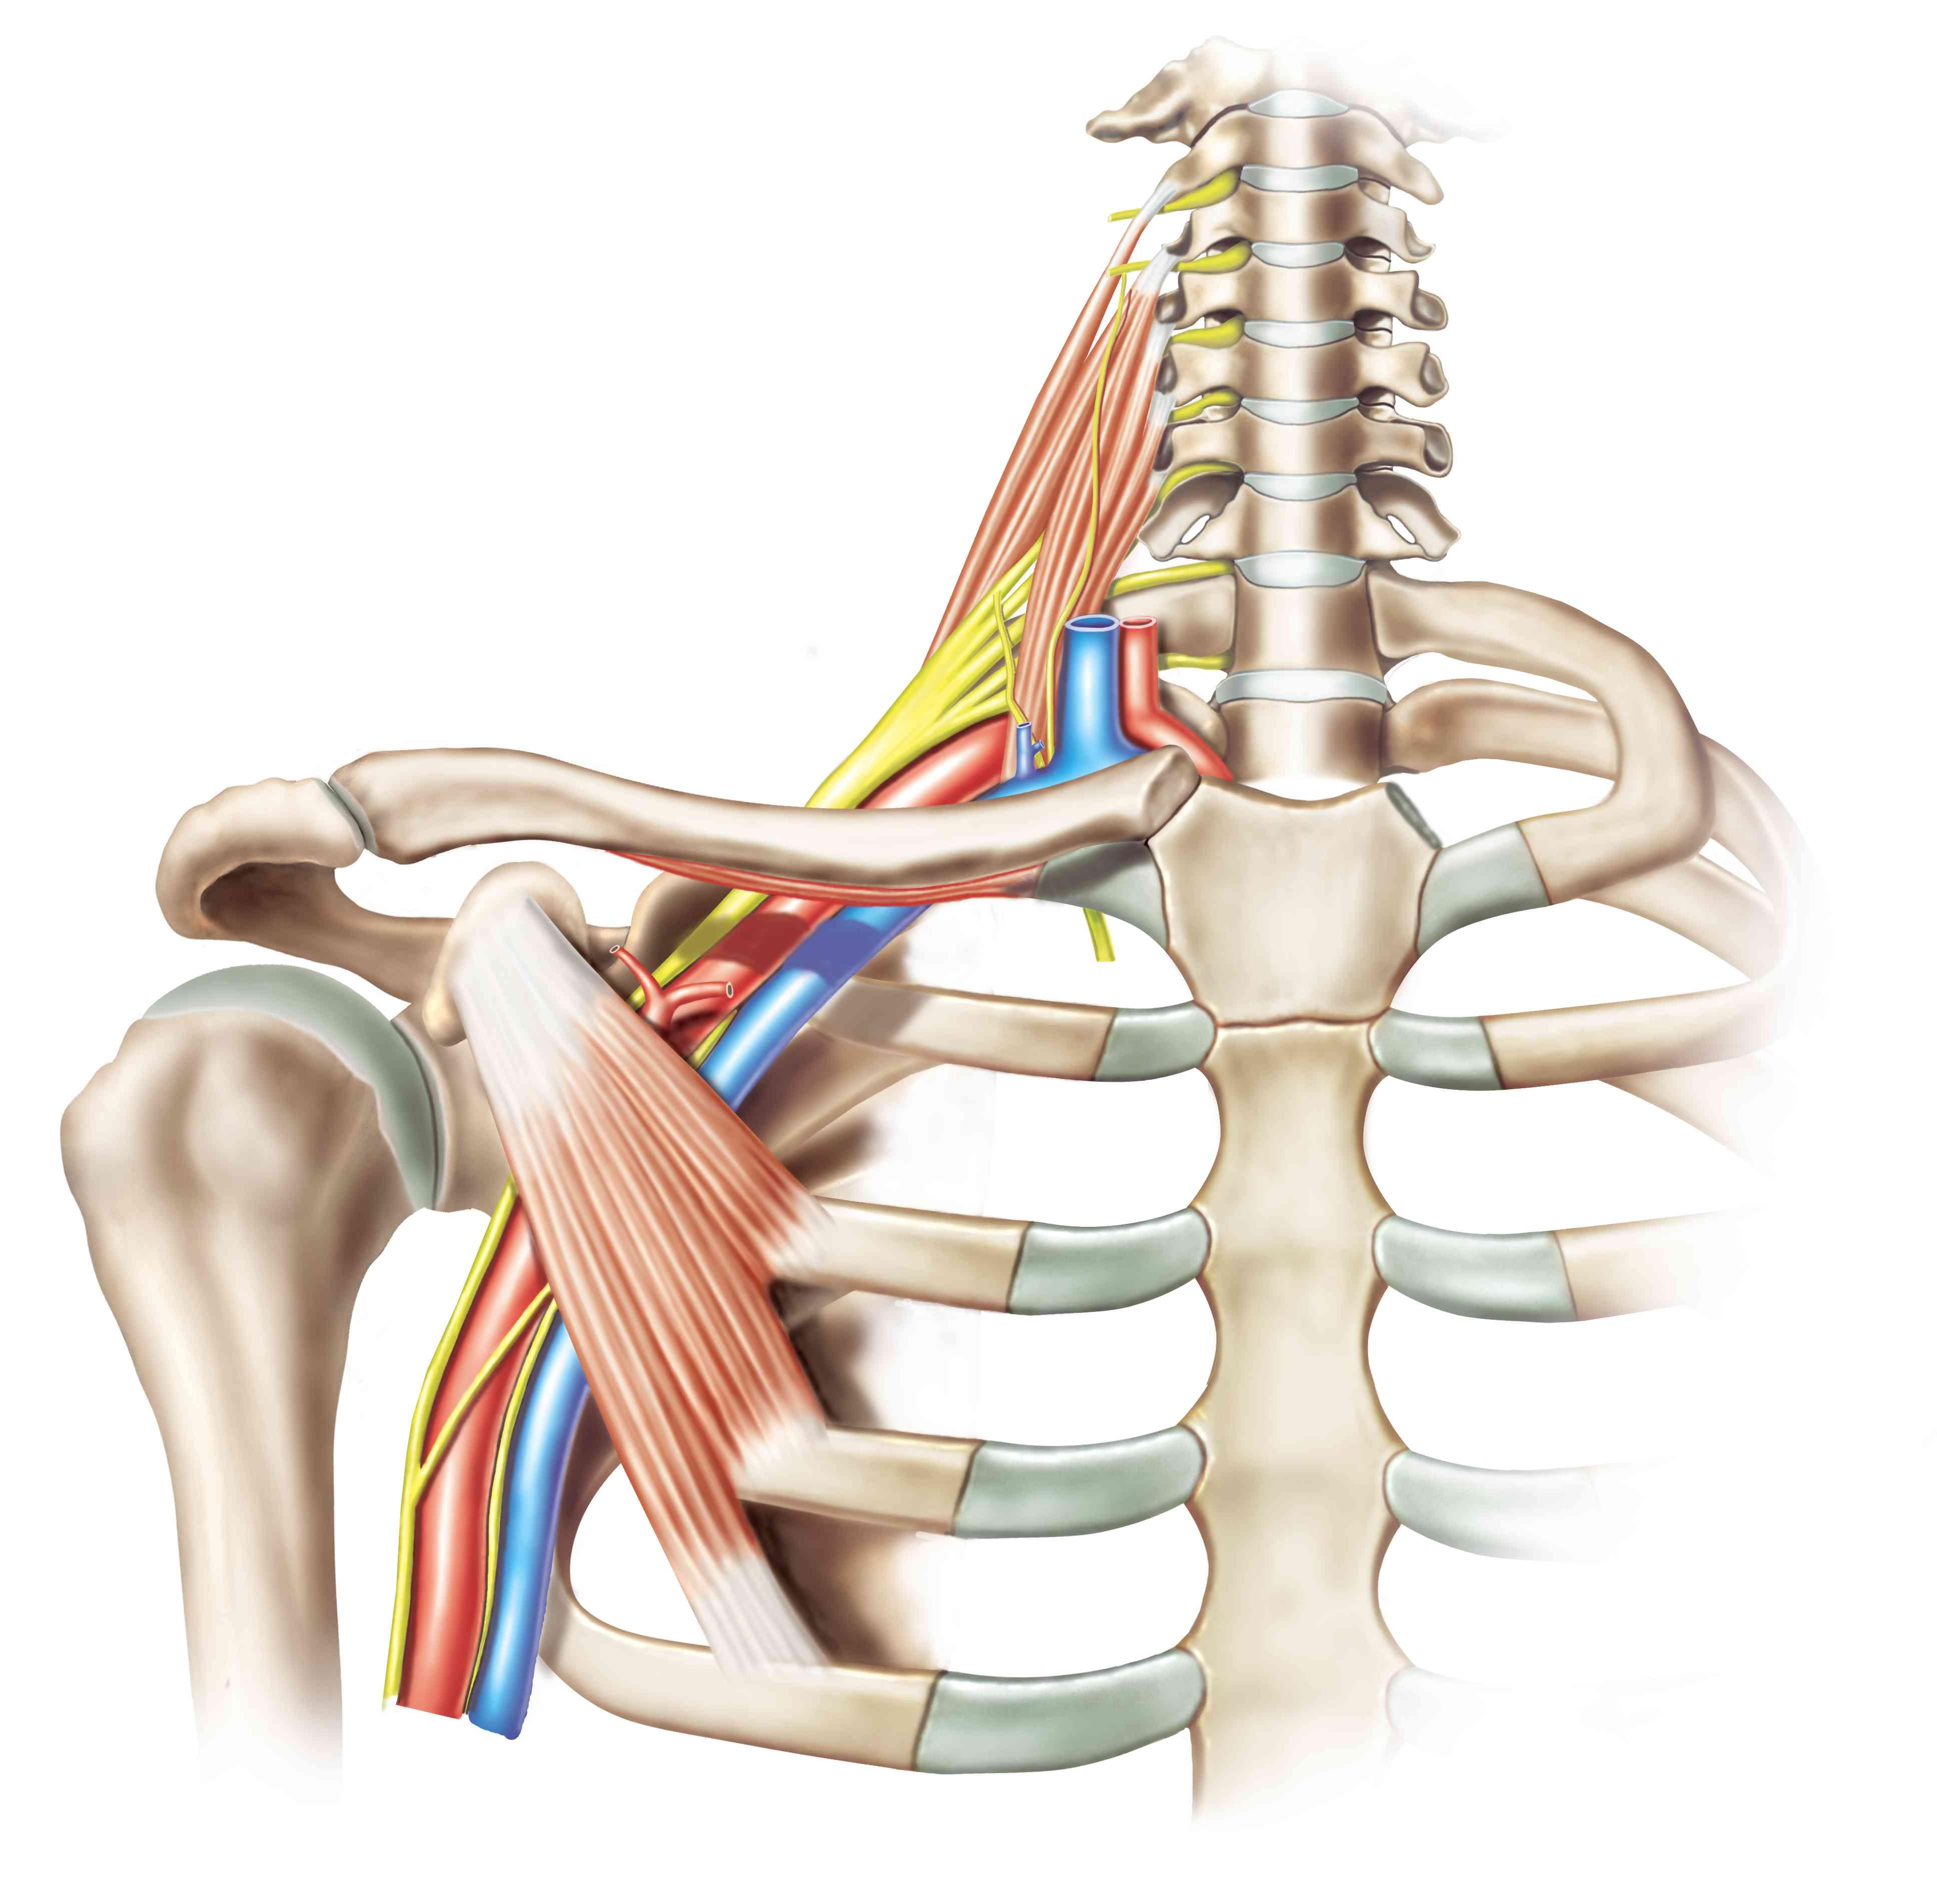 illustration showing the structures of the brachial plexus